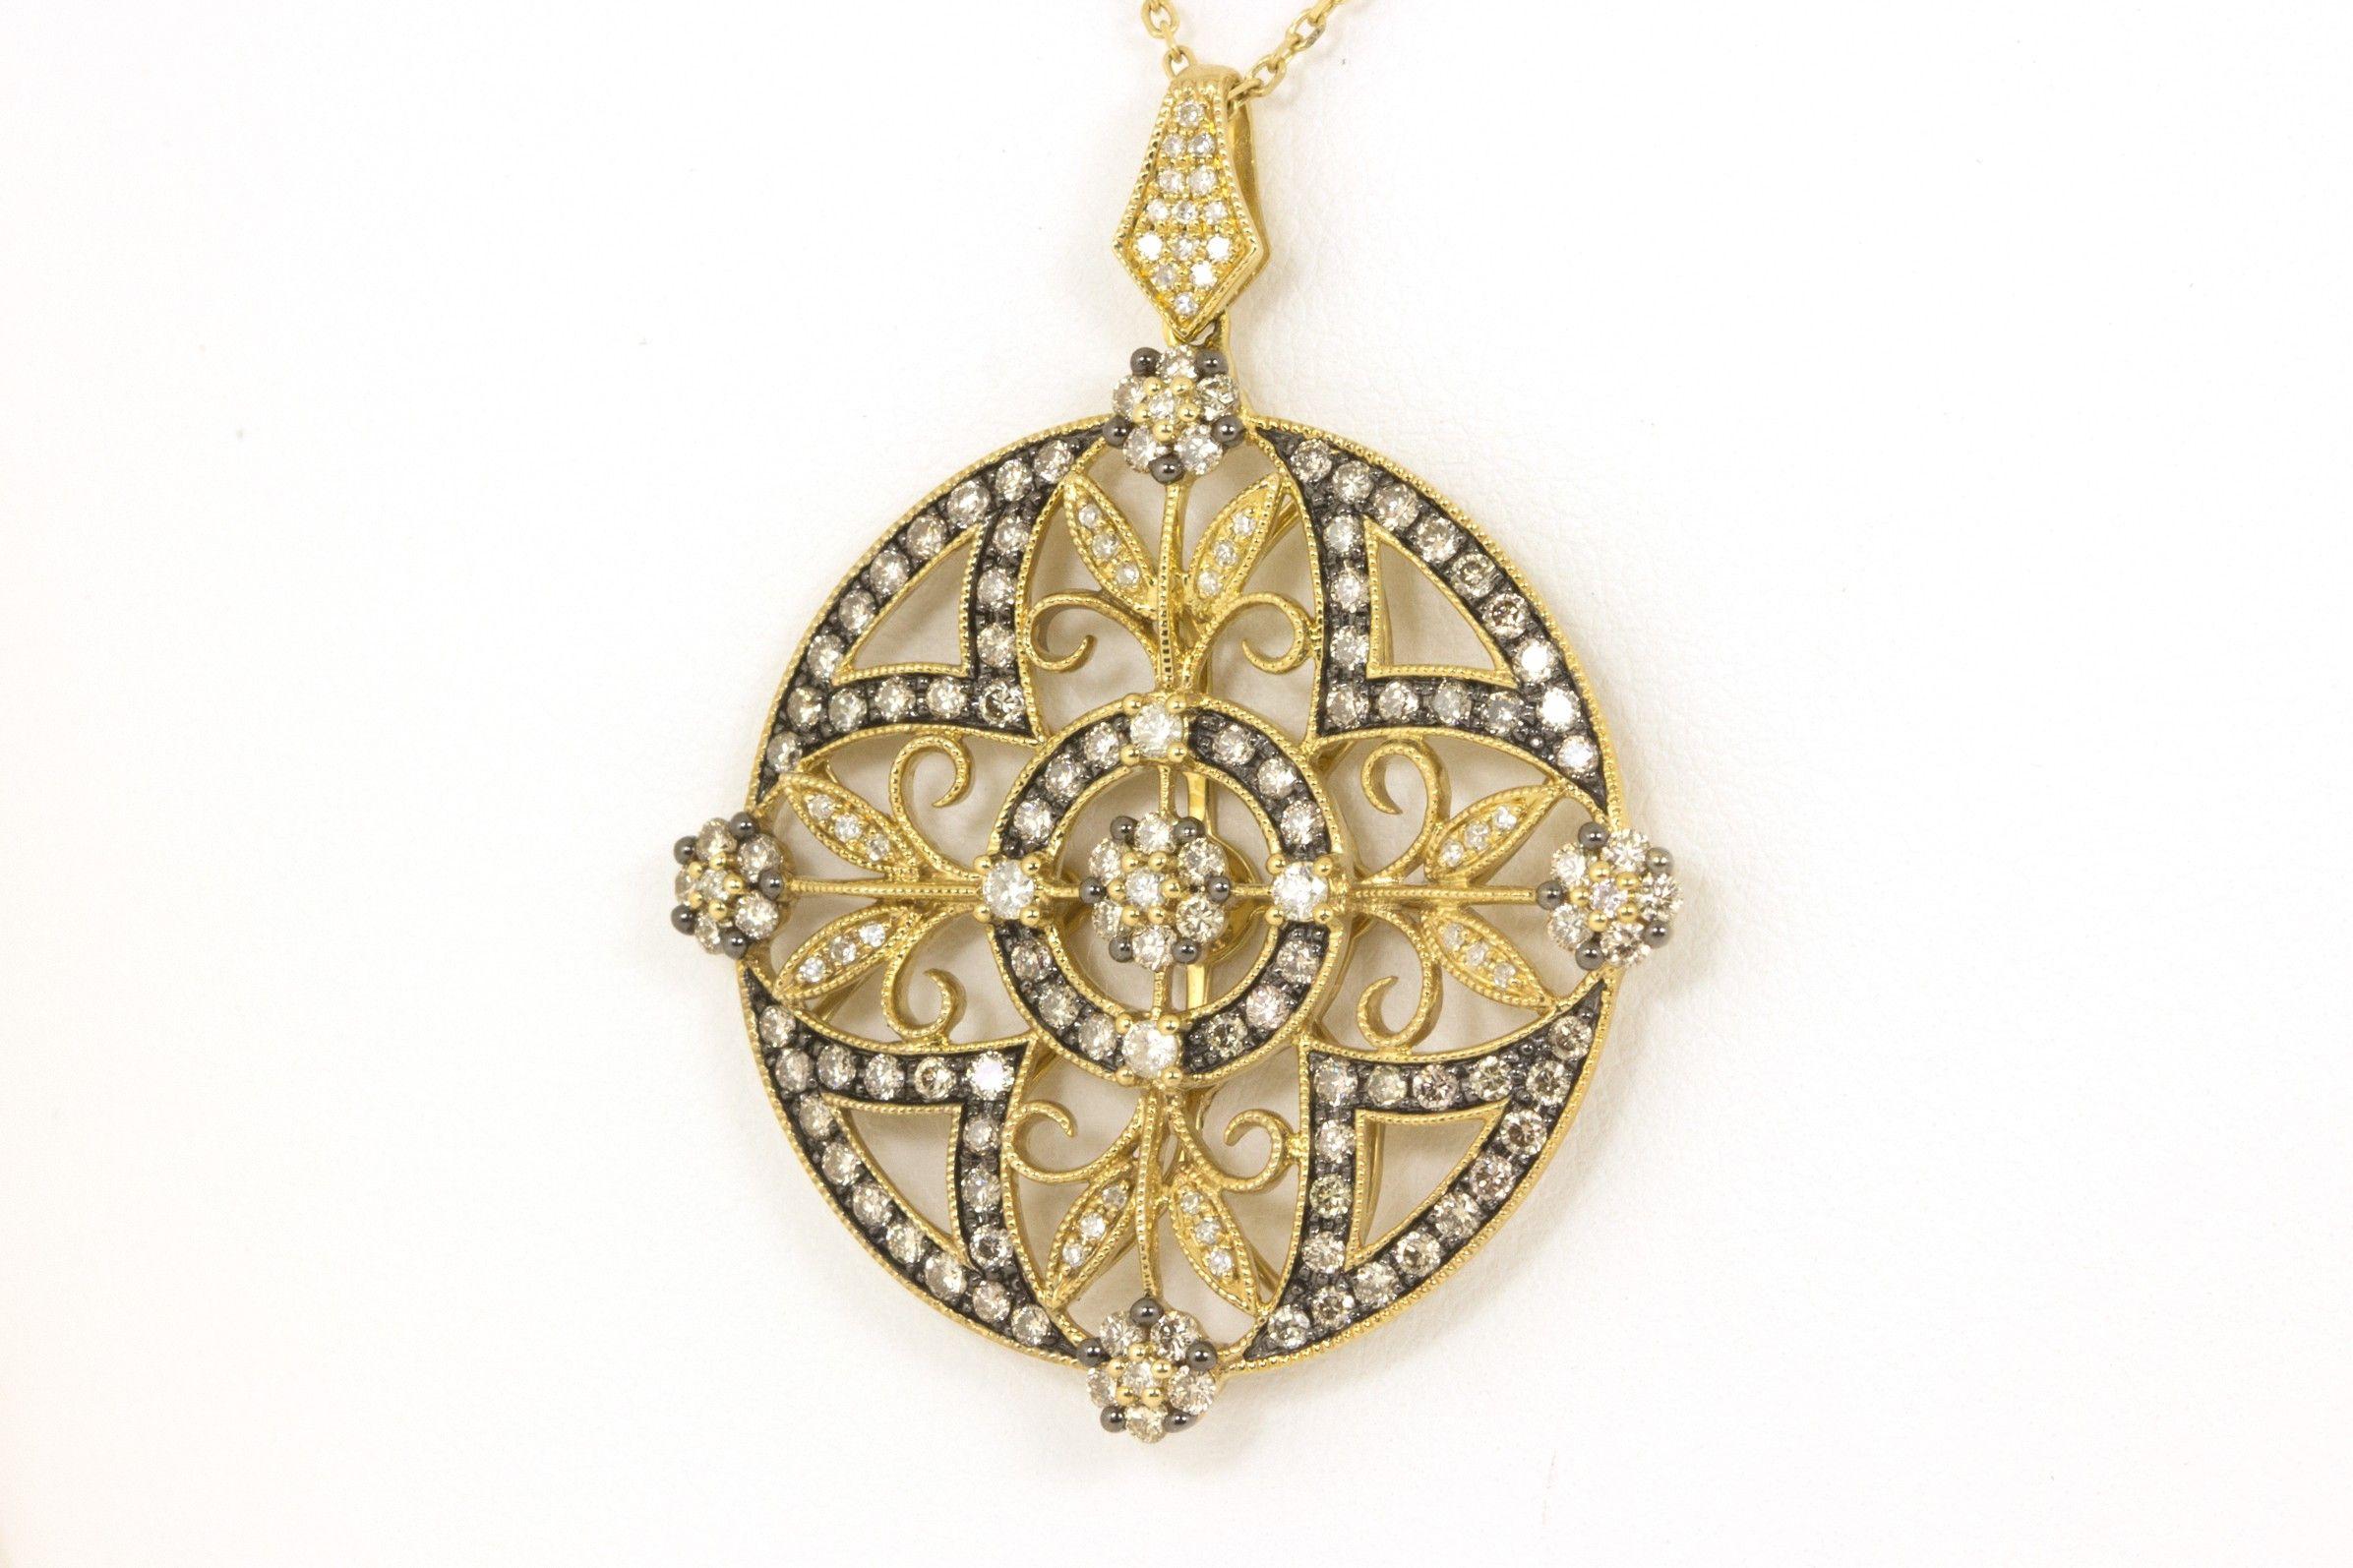 Filigree Diamond Pendant with Pave Diamonds and Black Rhodium Accent